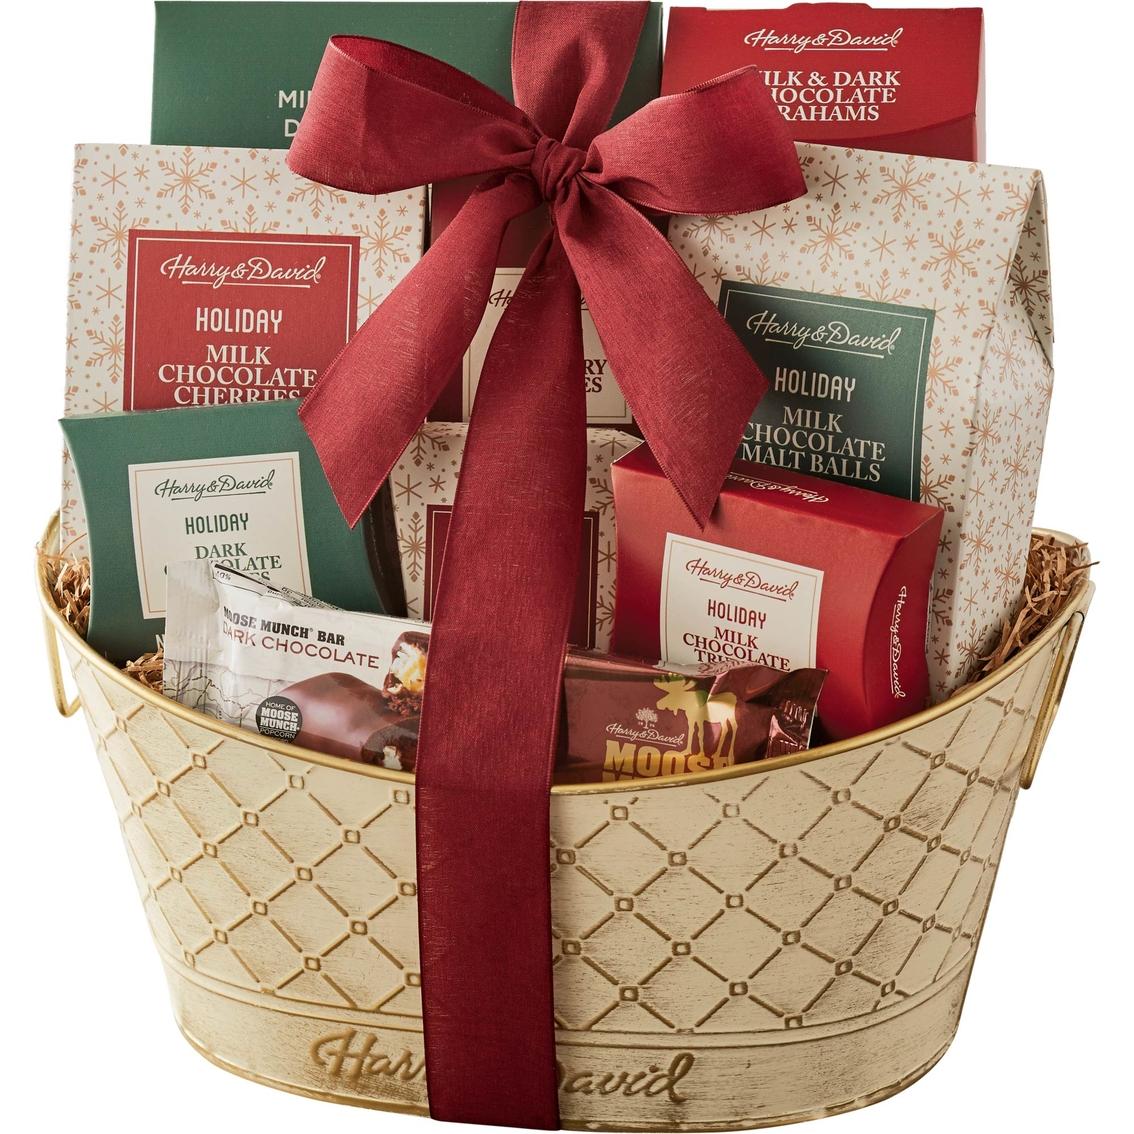 Harry & David Holiday Cheer Gift Basket